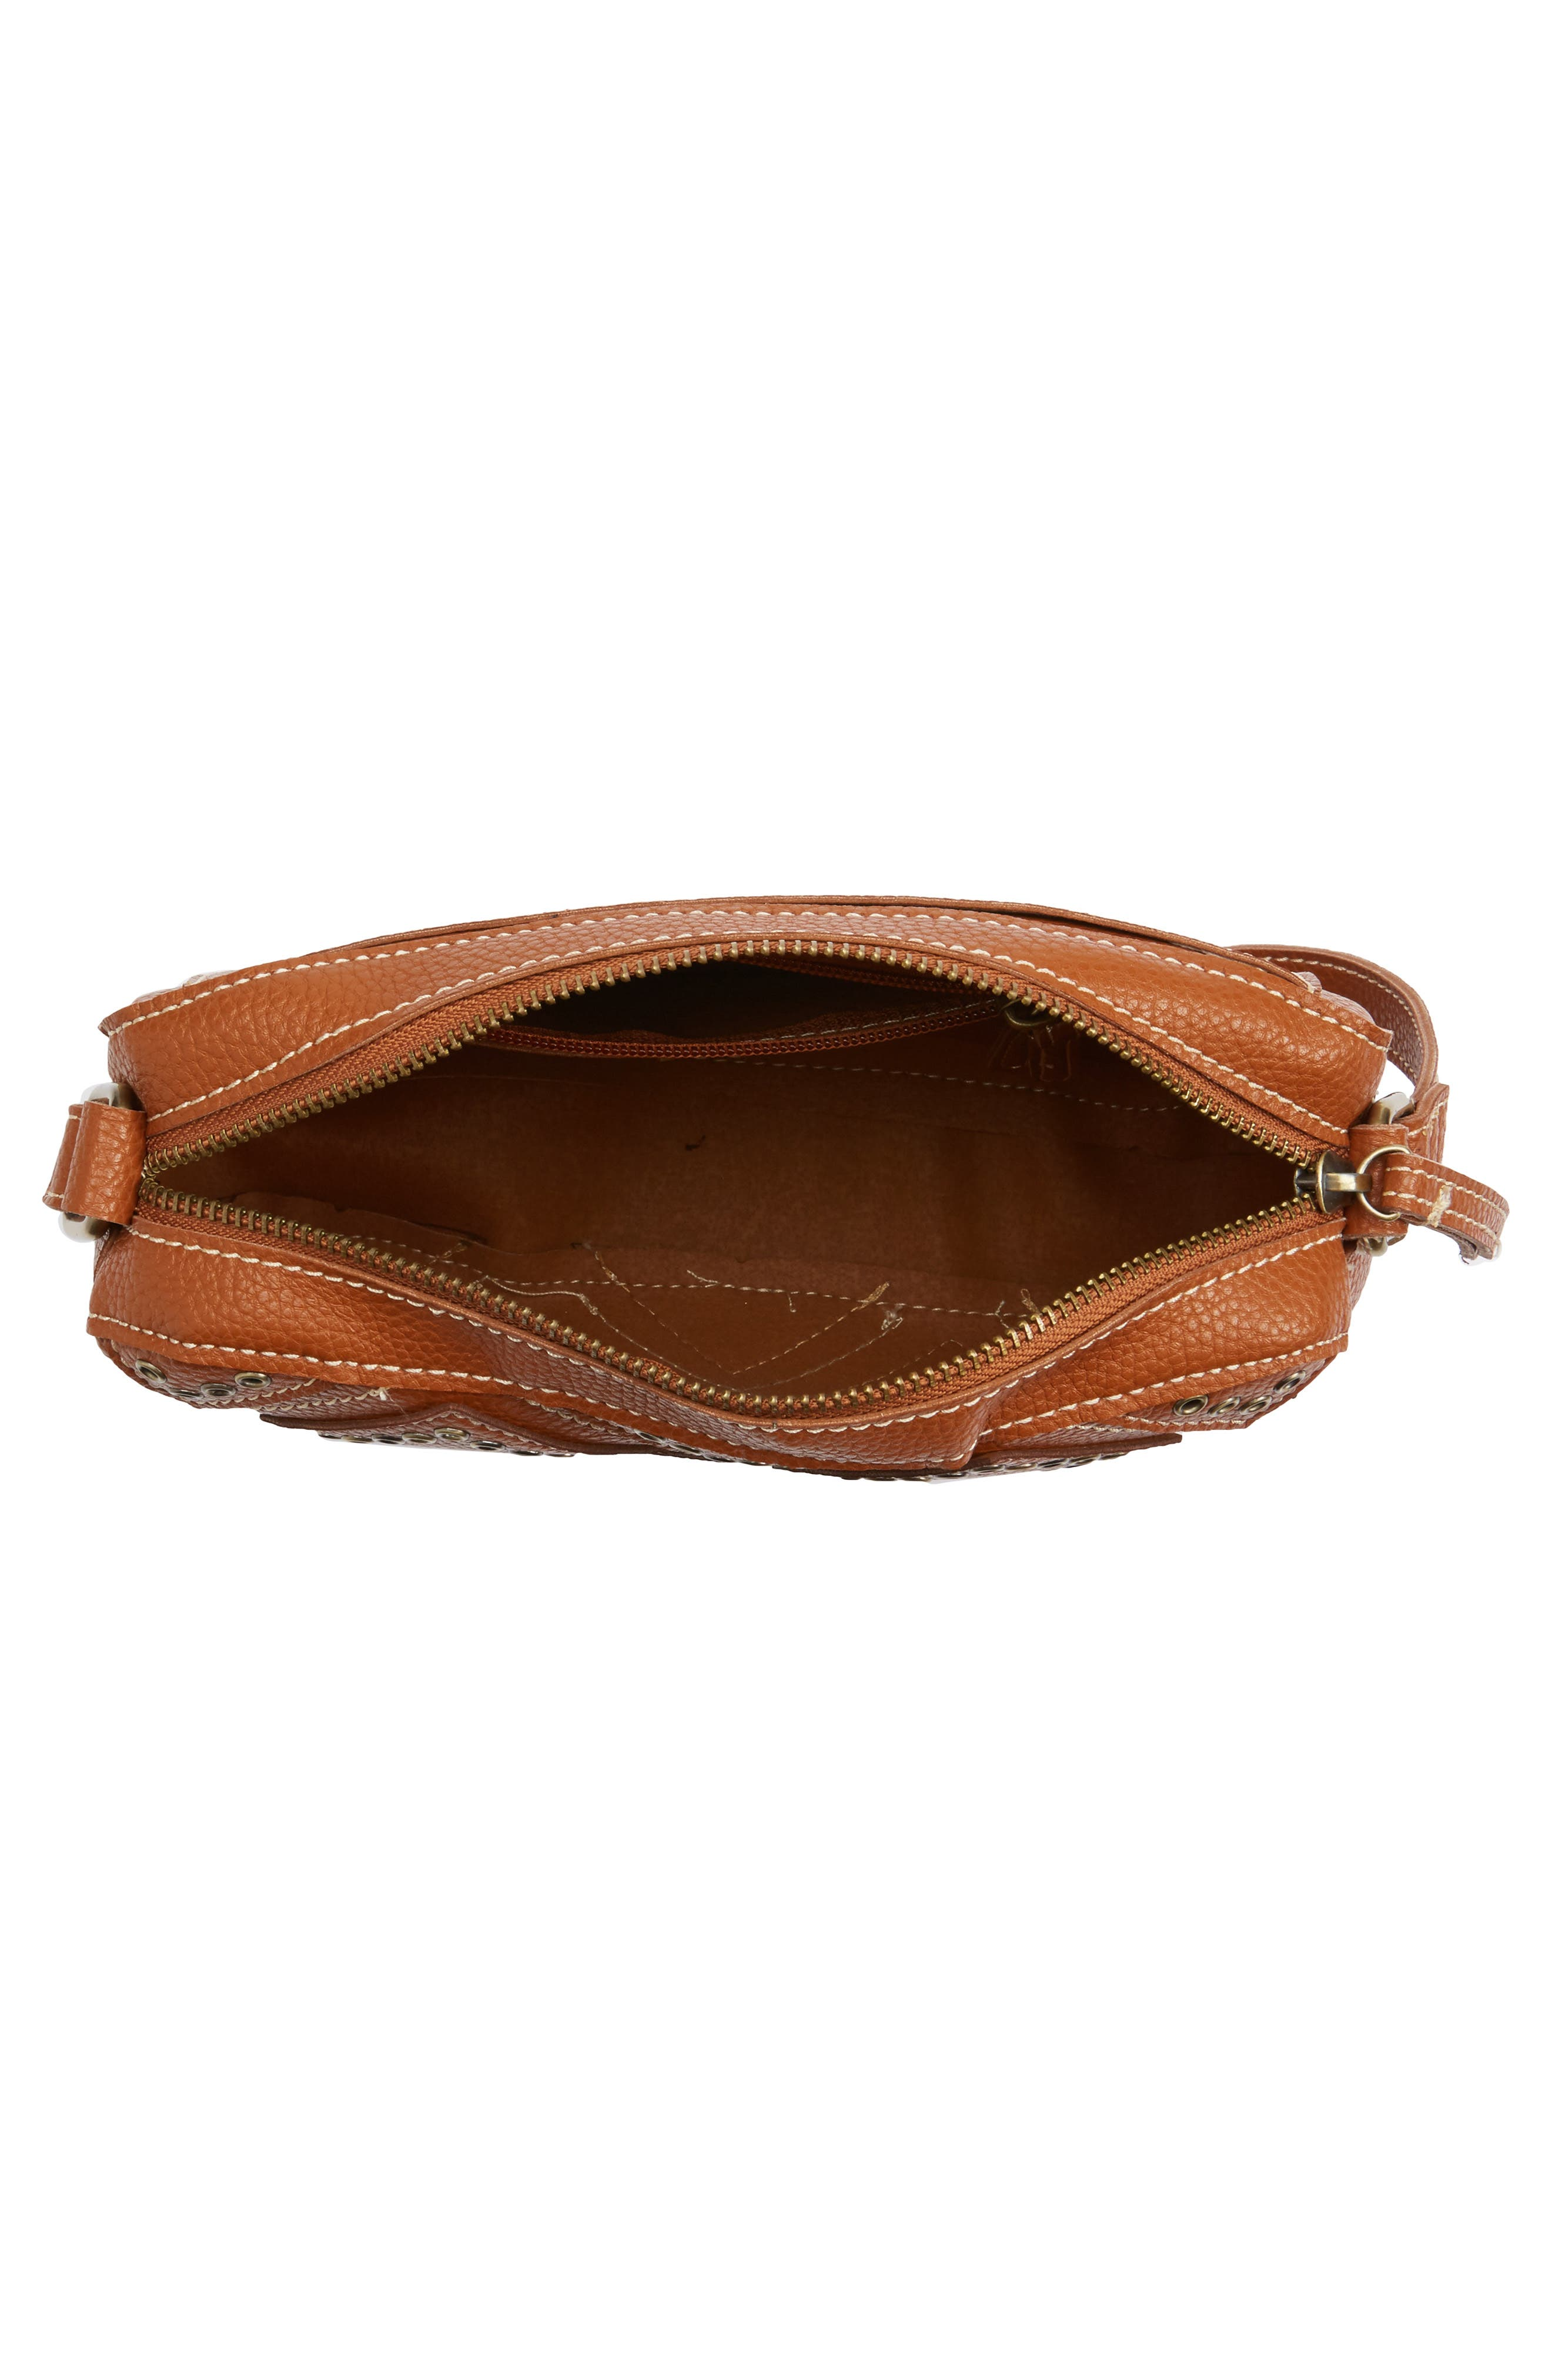 Skylar Faux Leather Crossbody Bag,                             Alternate thumbnail 4, color,